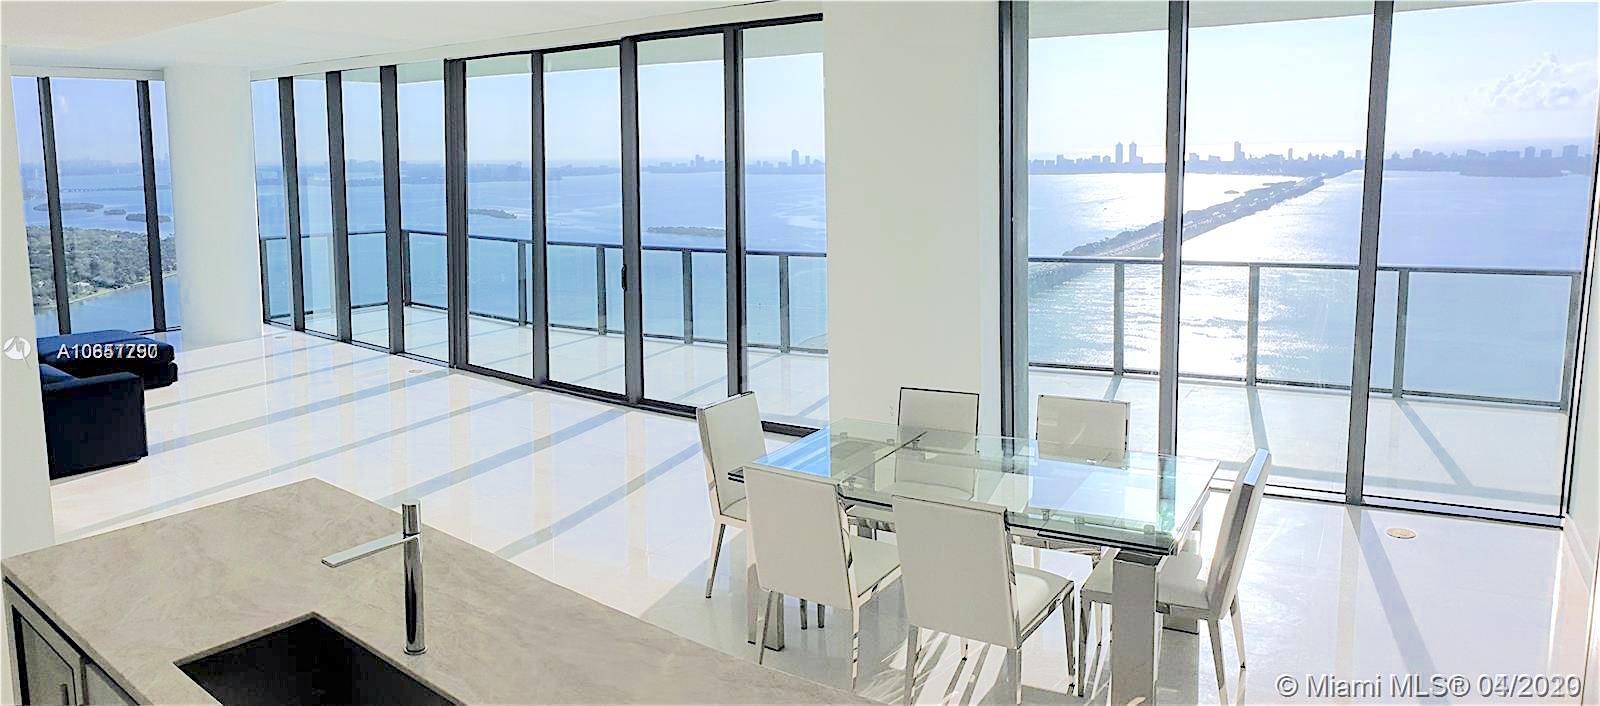 3131 NE 7th Ave, Unit #PH5003 Luxury Real Estate